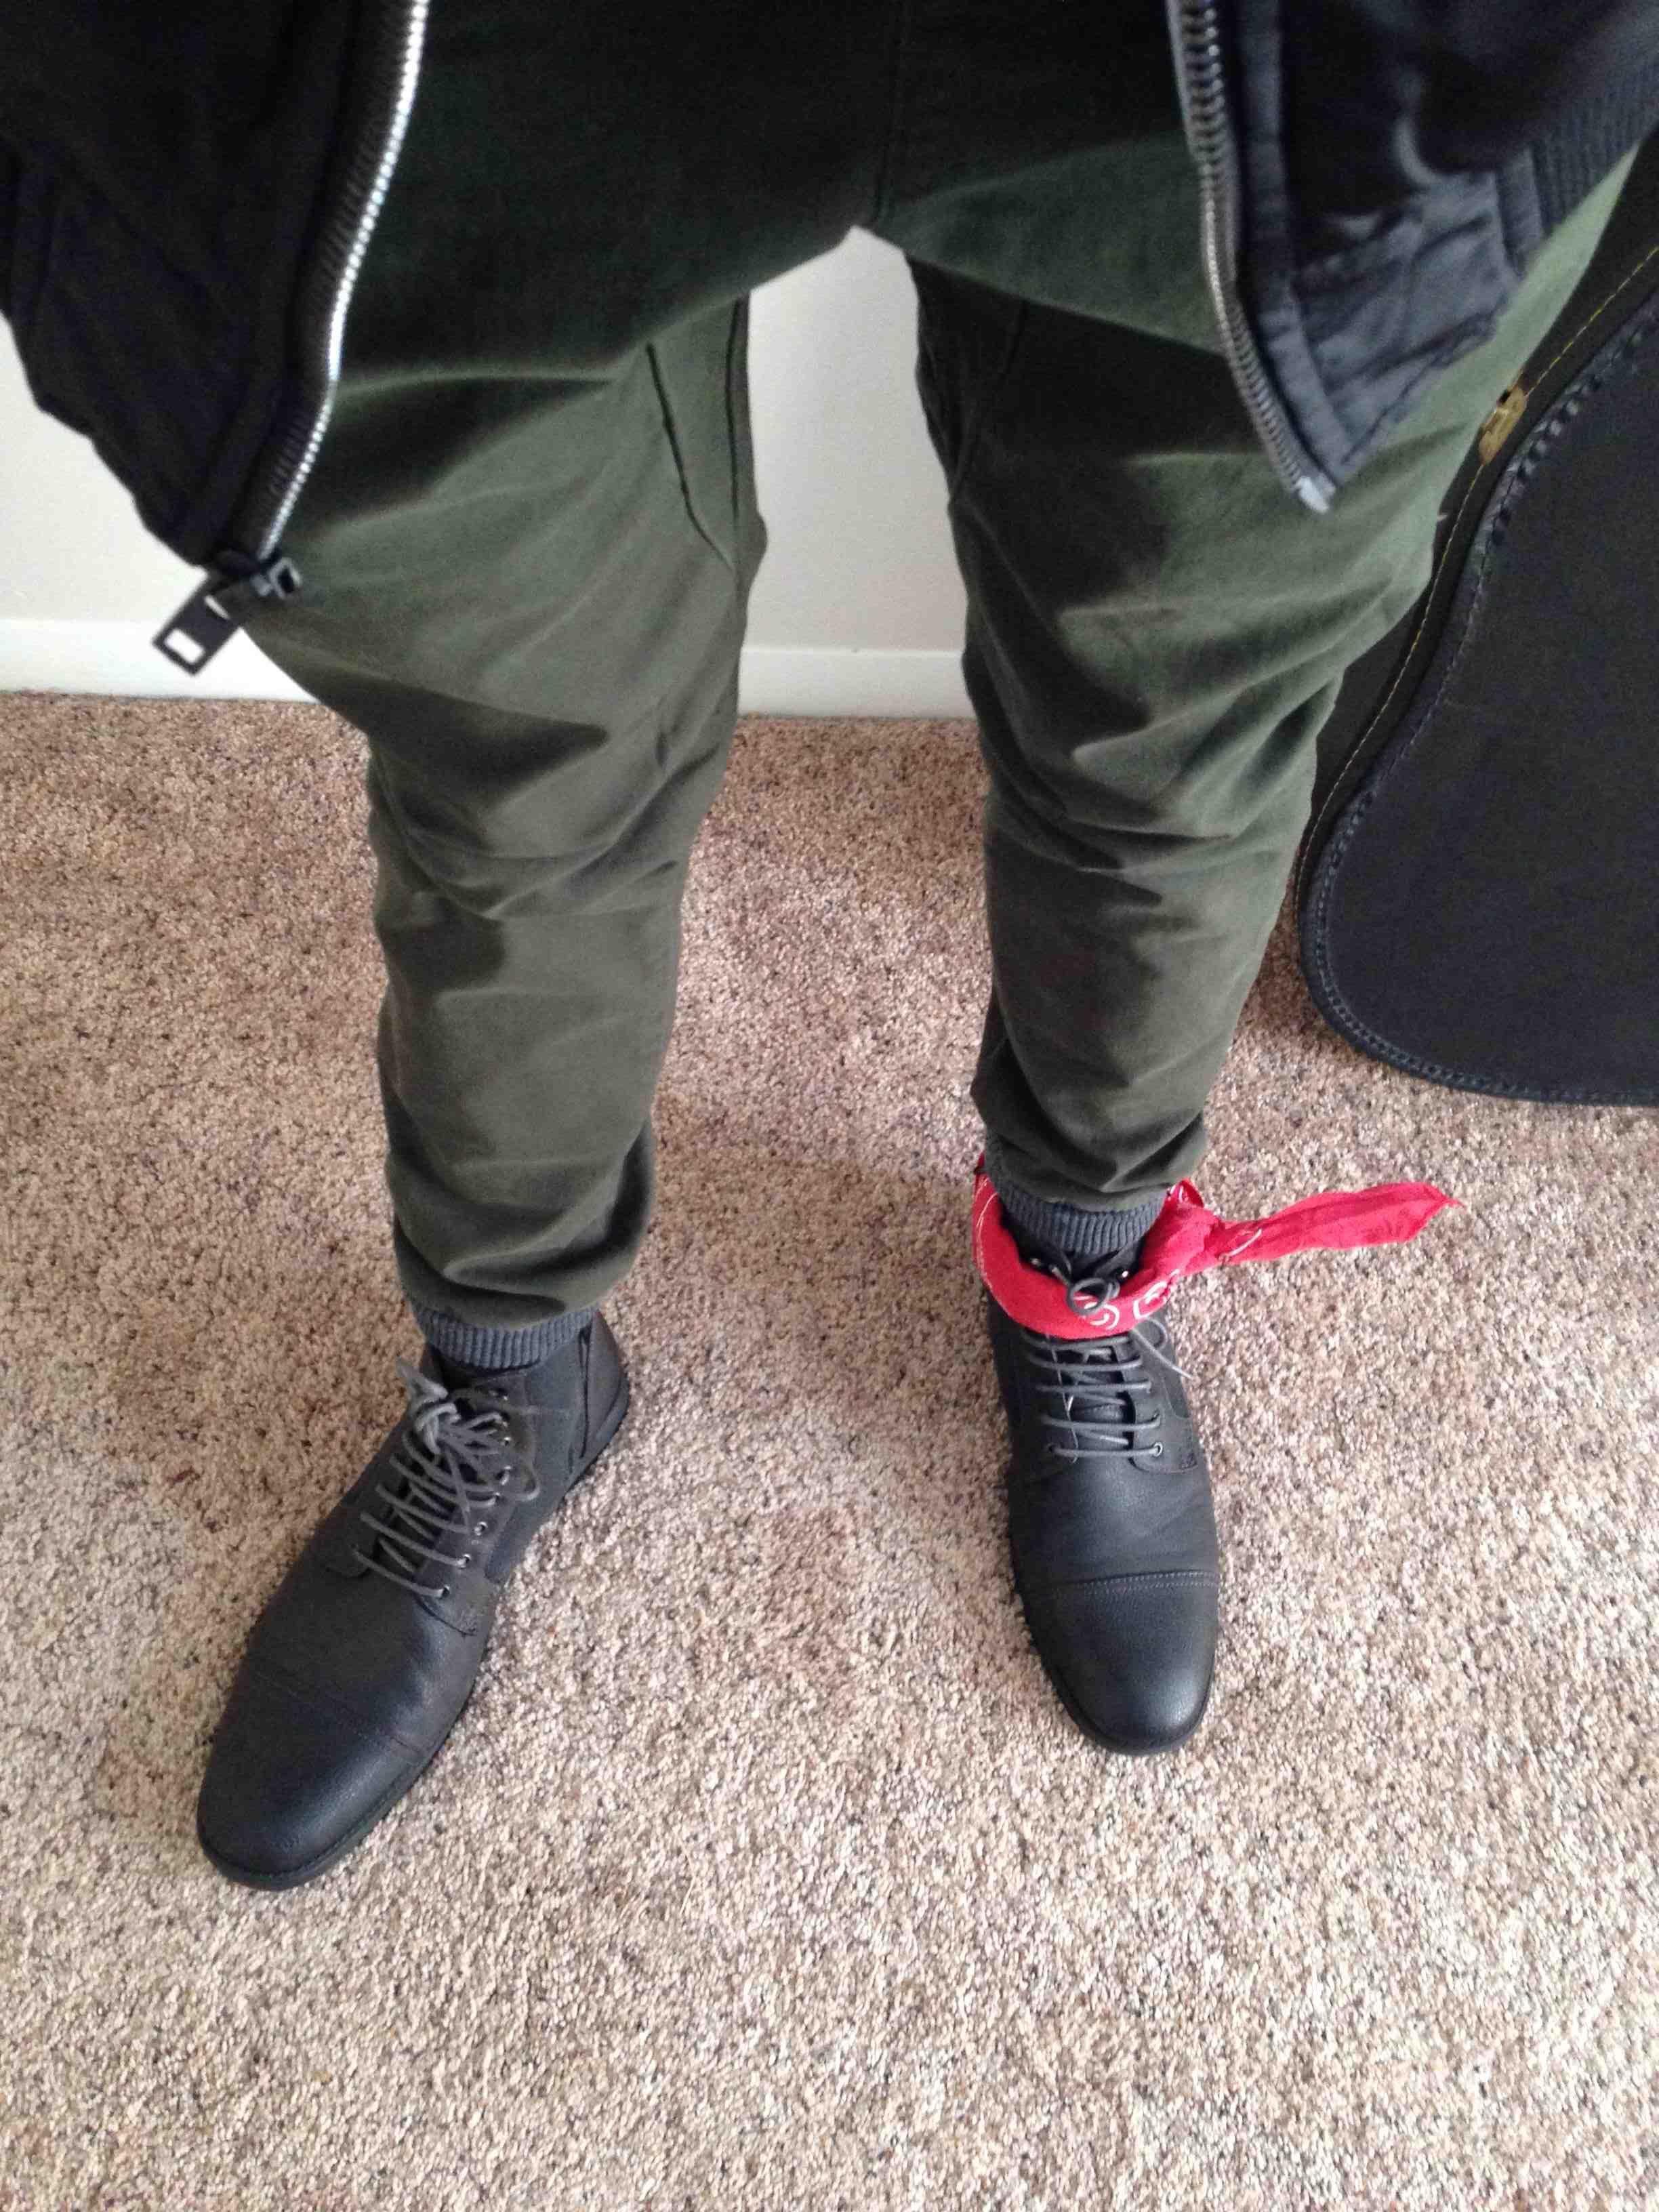 Bandana tied around ankle